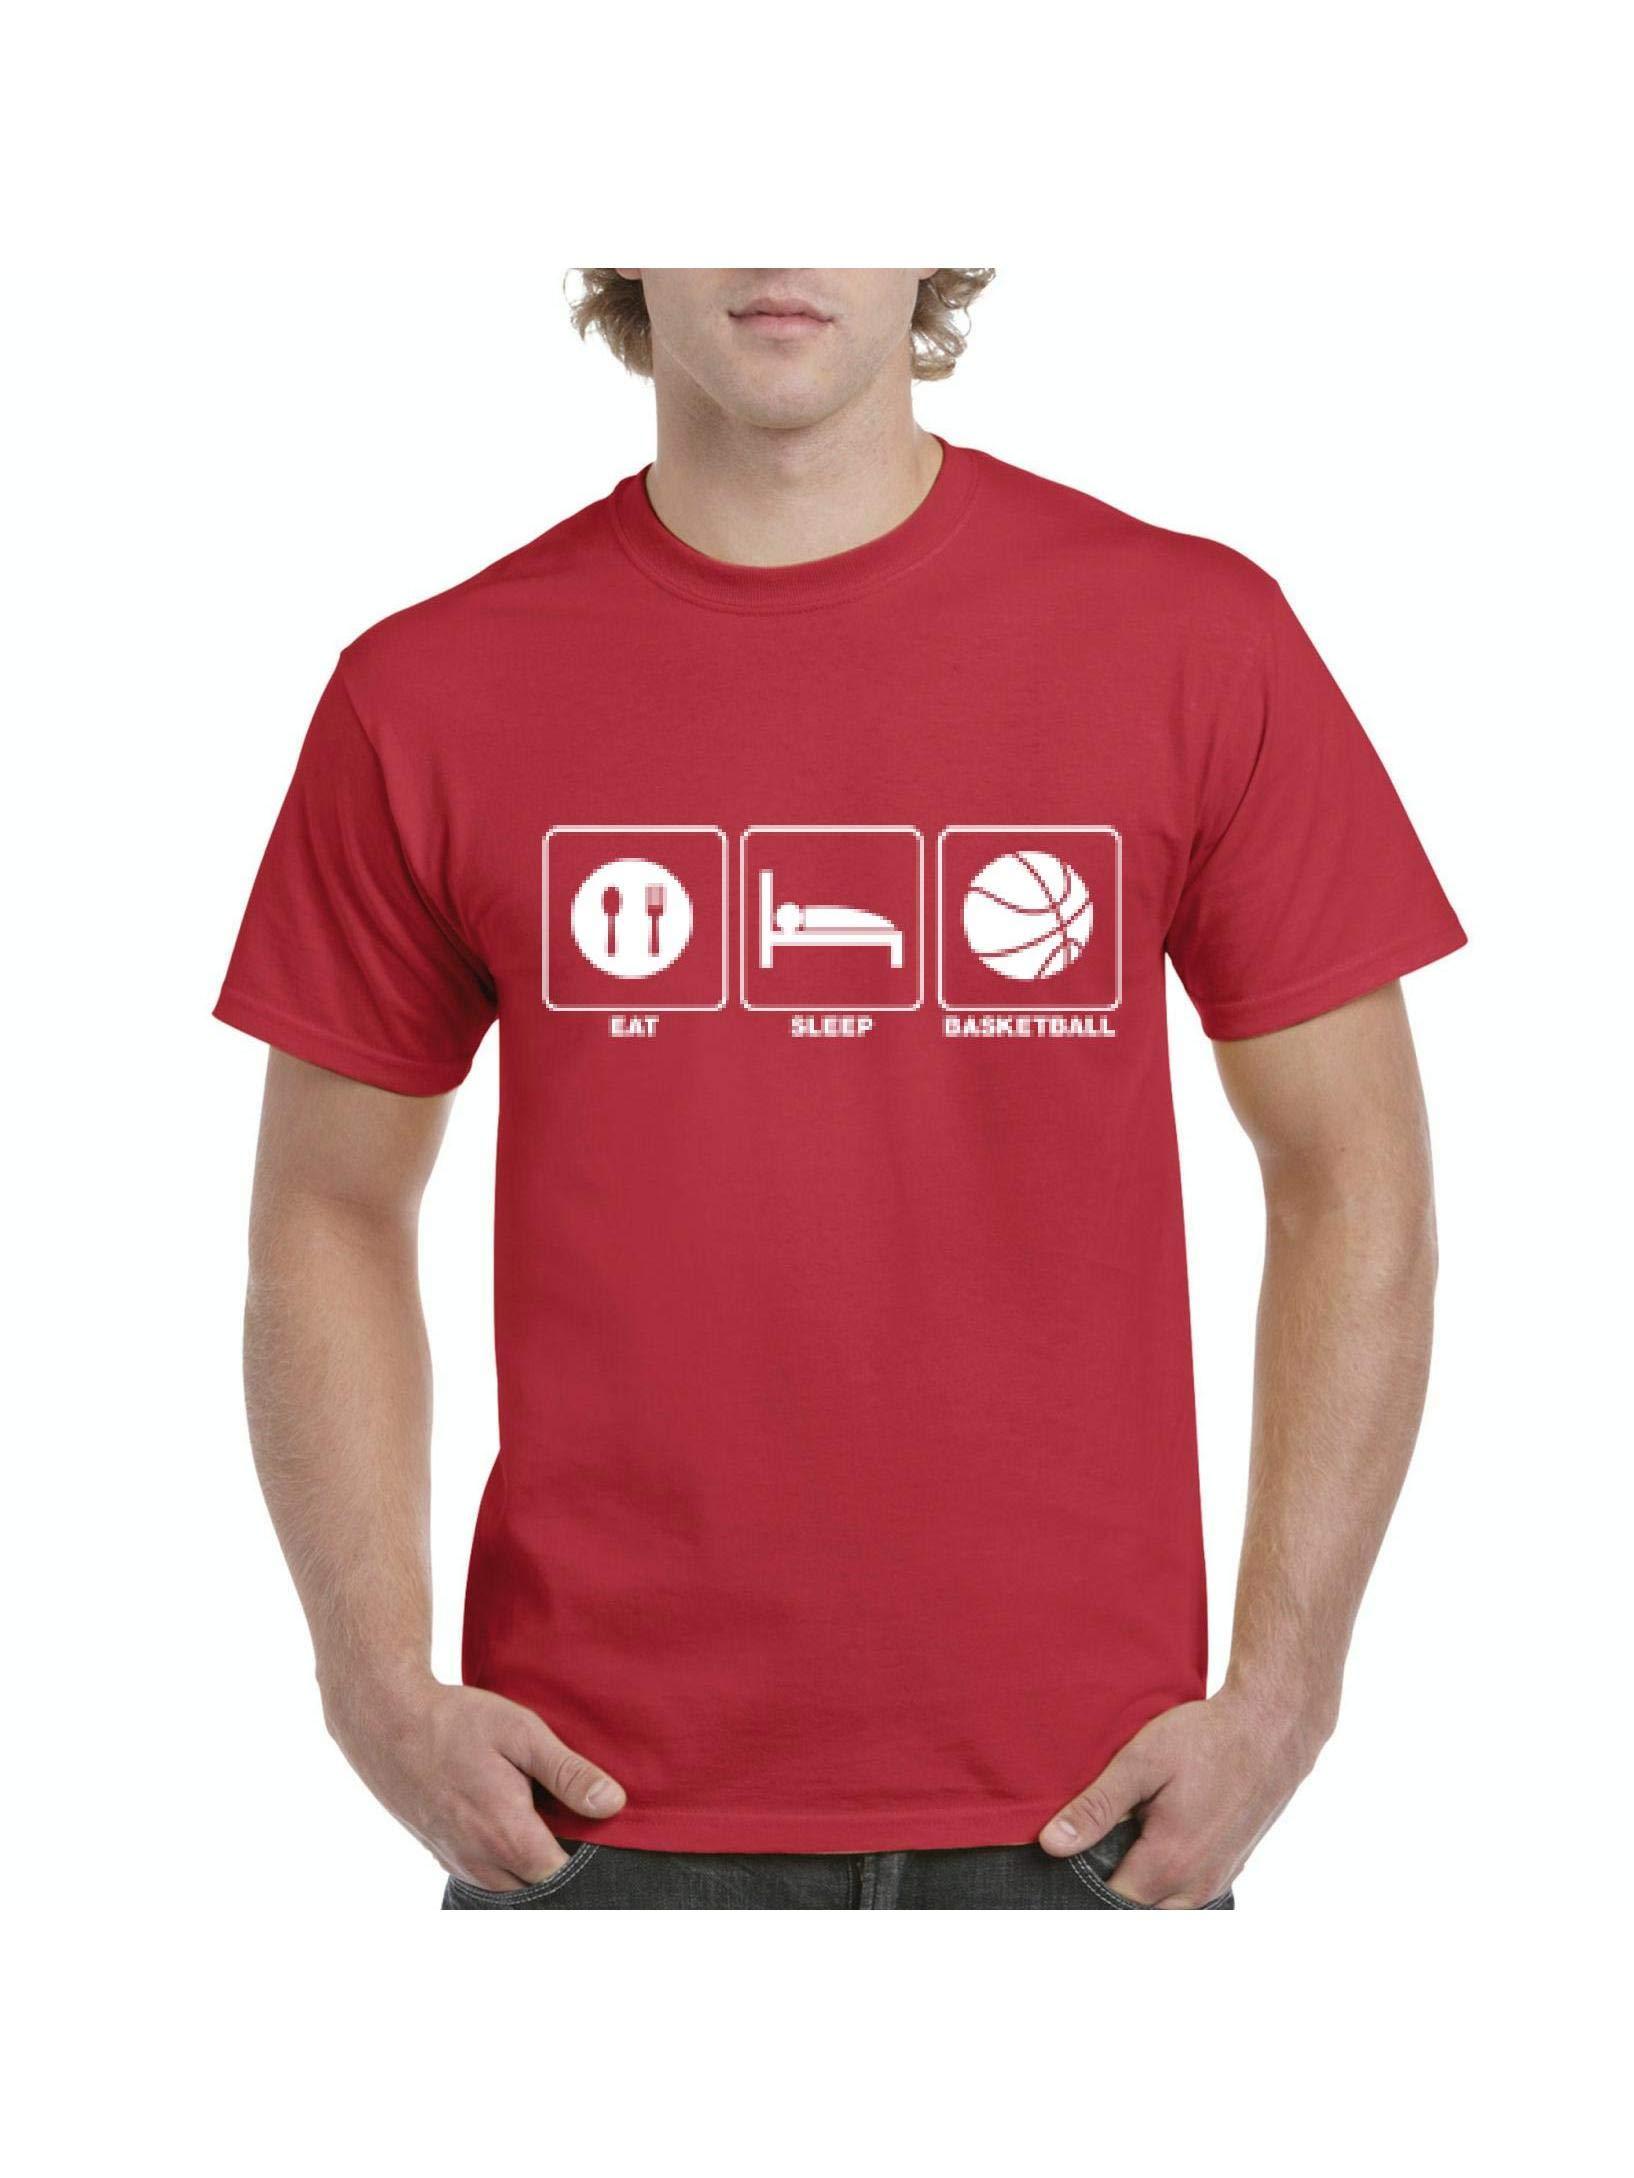 Eat Sleep Basketball Games Team Apparel Short Sleeve T Shirt 4858